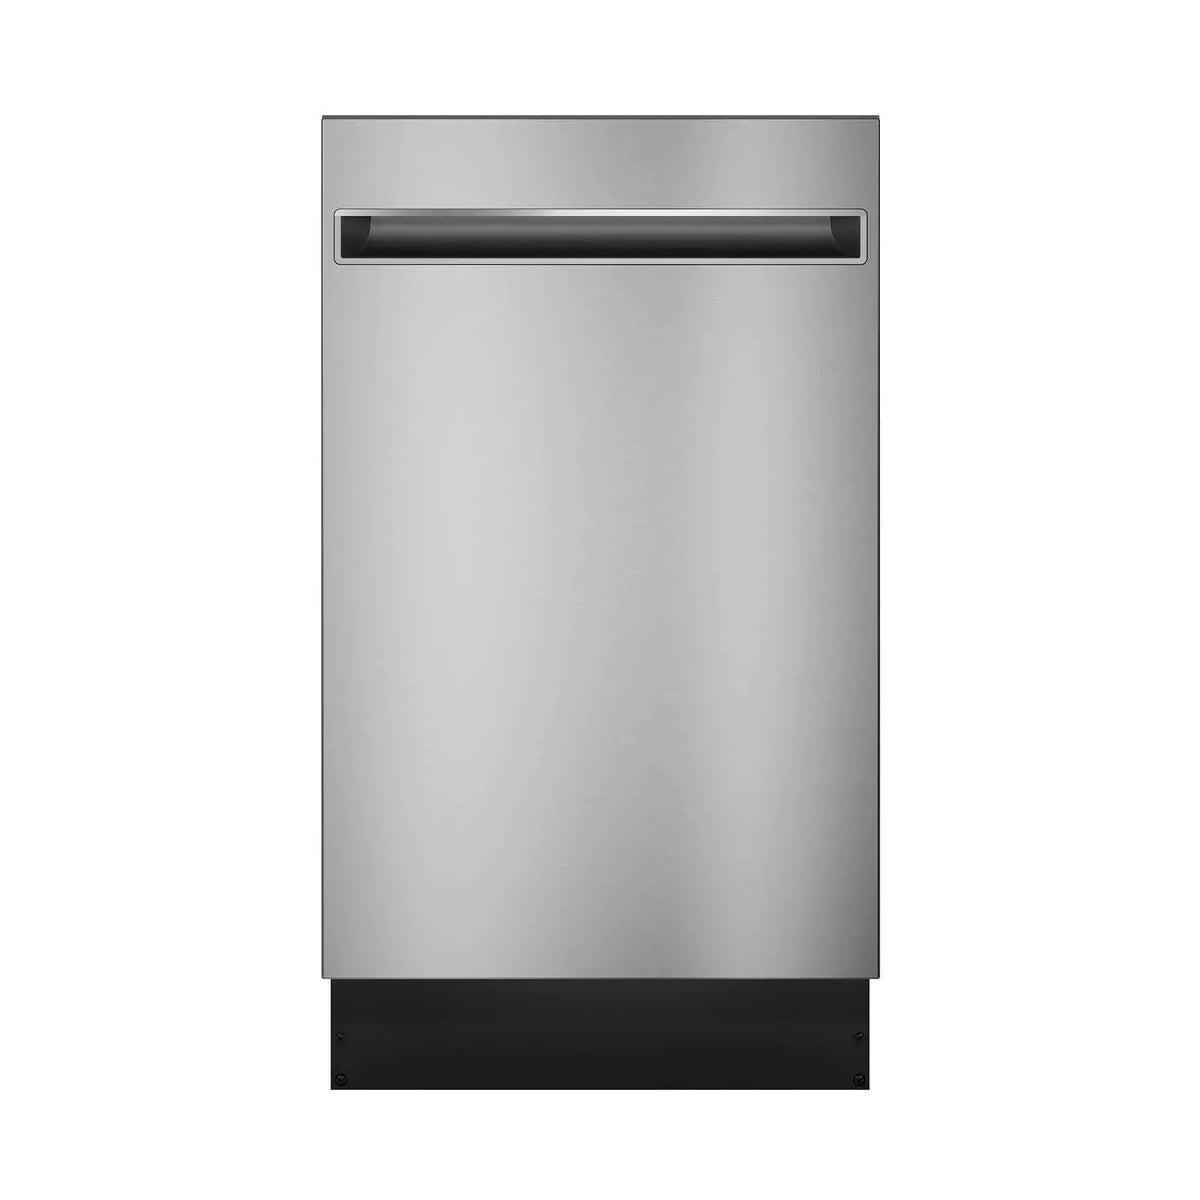 Best-Dishwashers-Option-GE-Profile-18-in-Stainless-Steel-Smart-Dishwasher